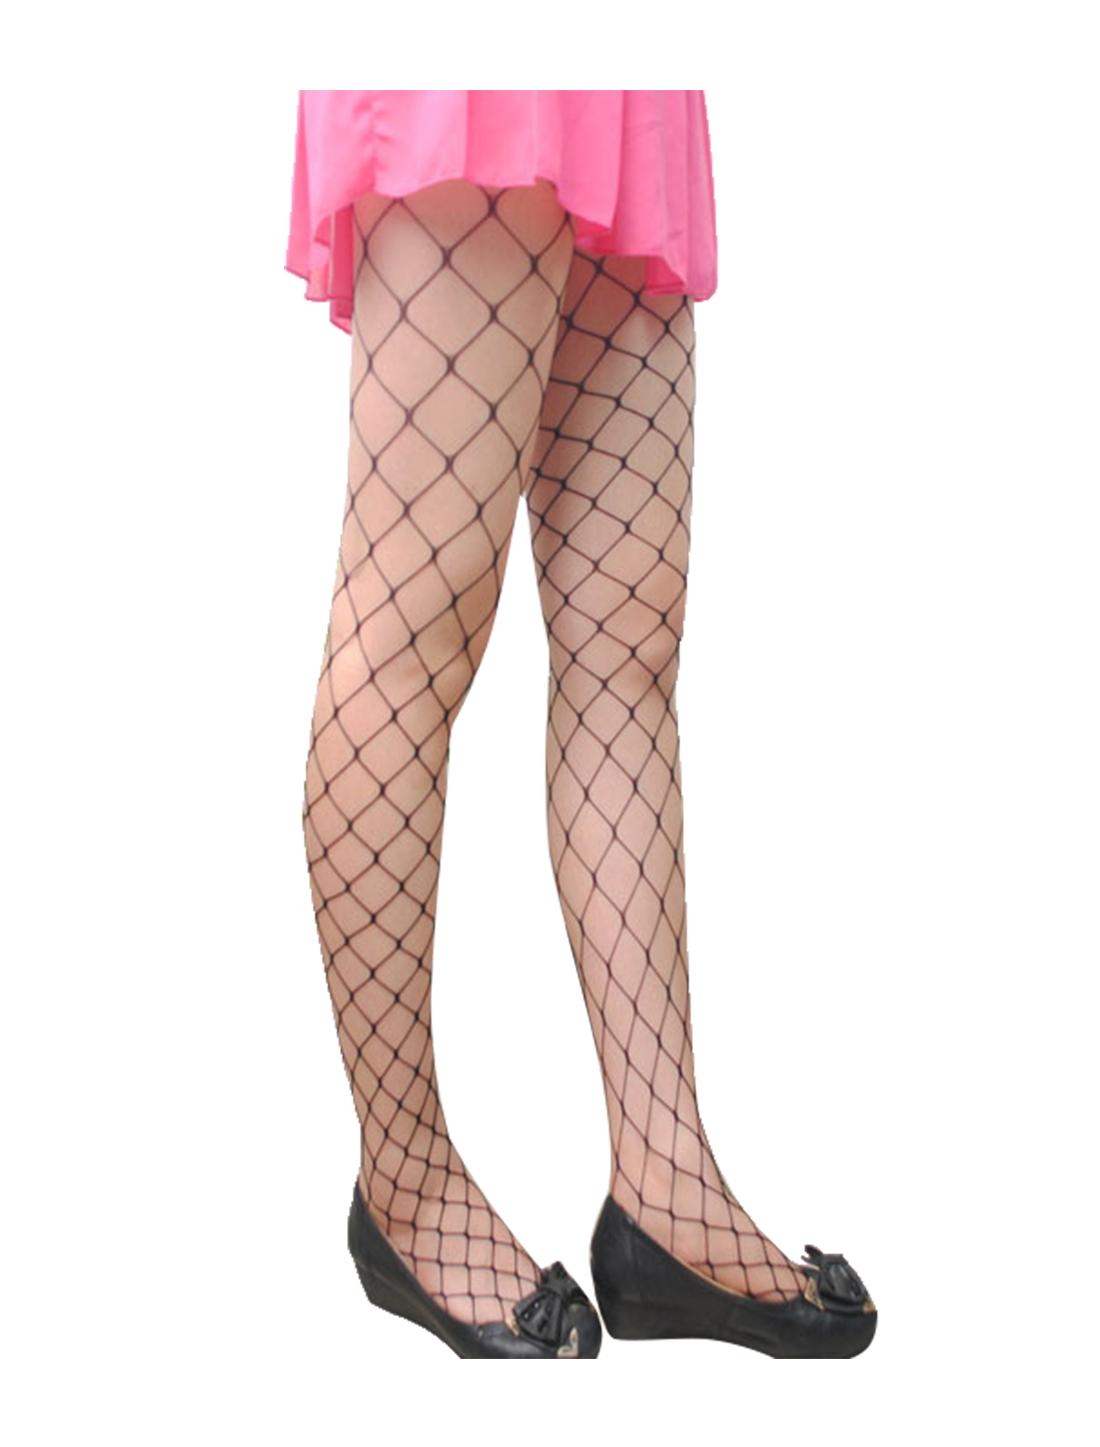 Women 2 Pack Trendy Strechy Fishnet Stockings Pantyhose Max Net Black